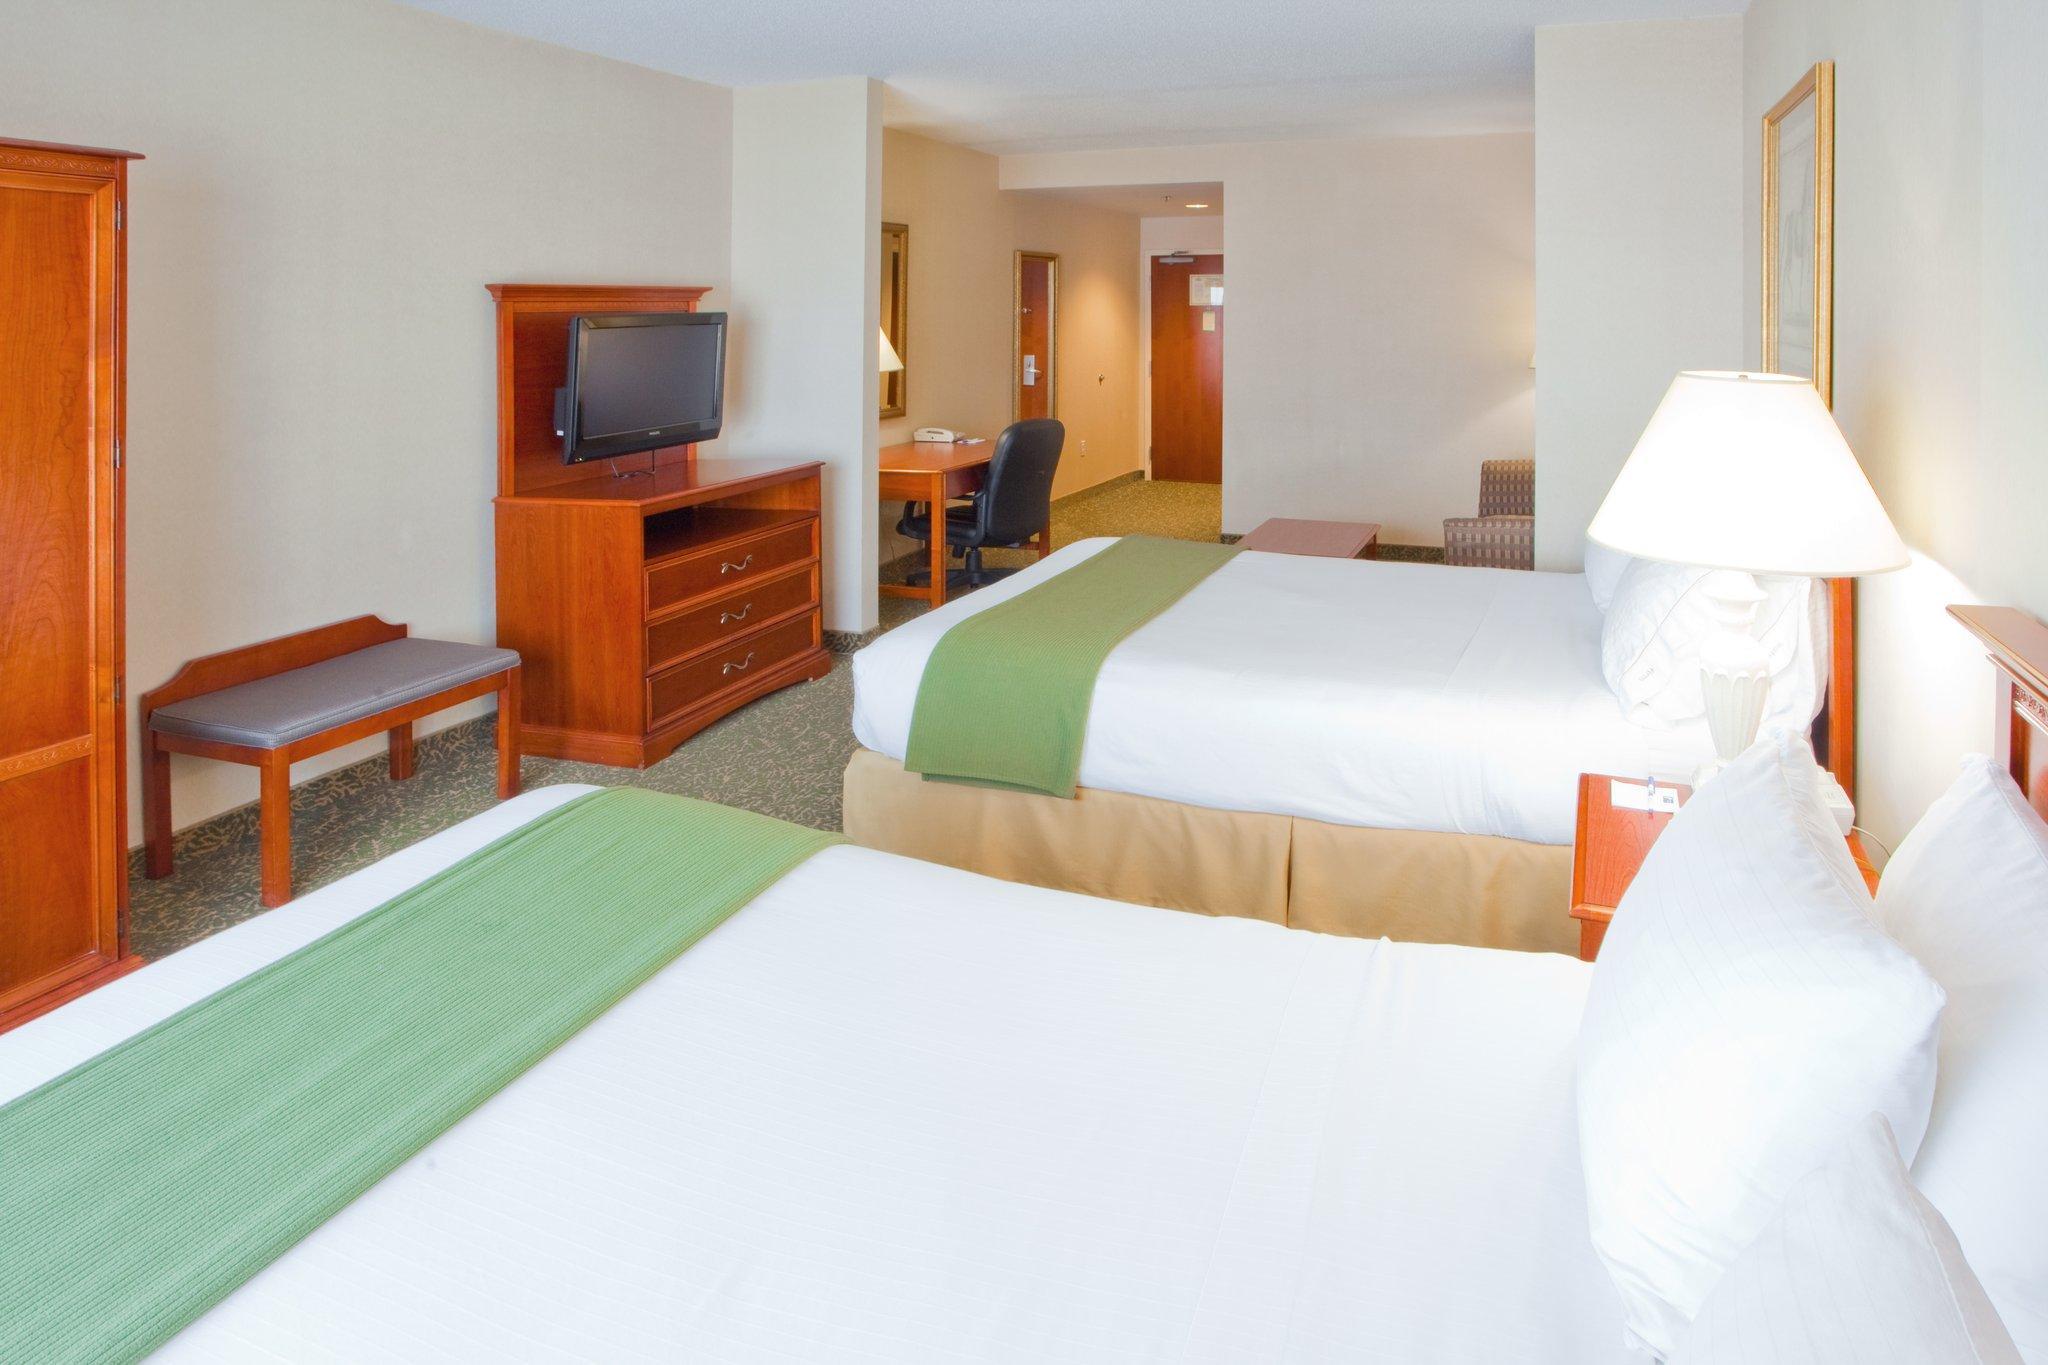 Holiday Inn Express Hagerstown